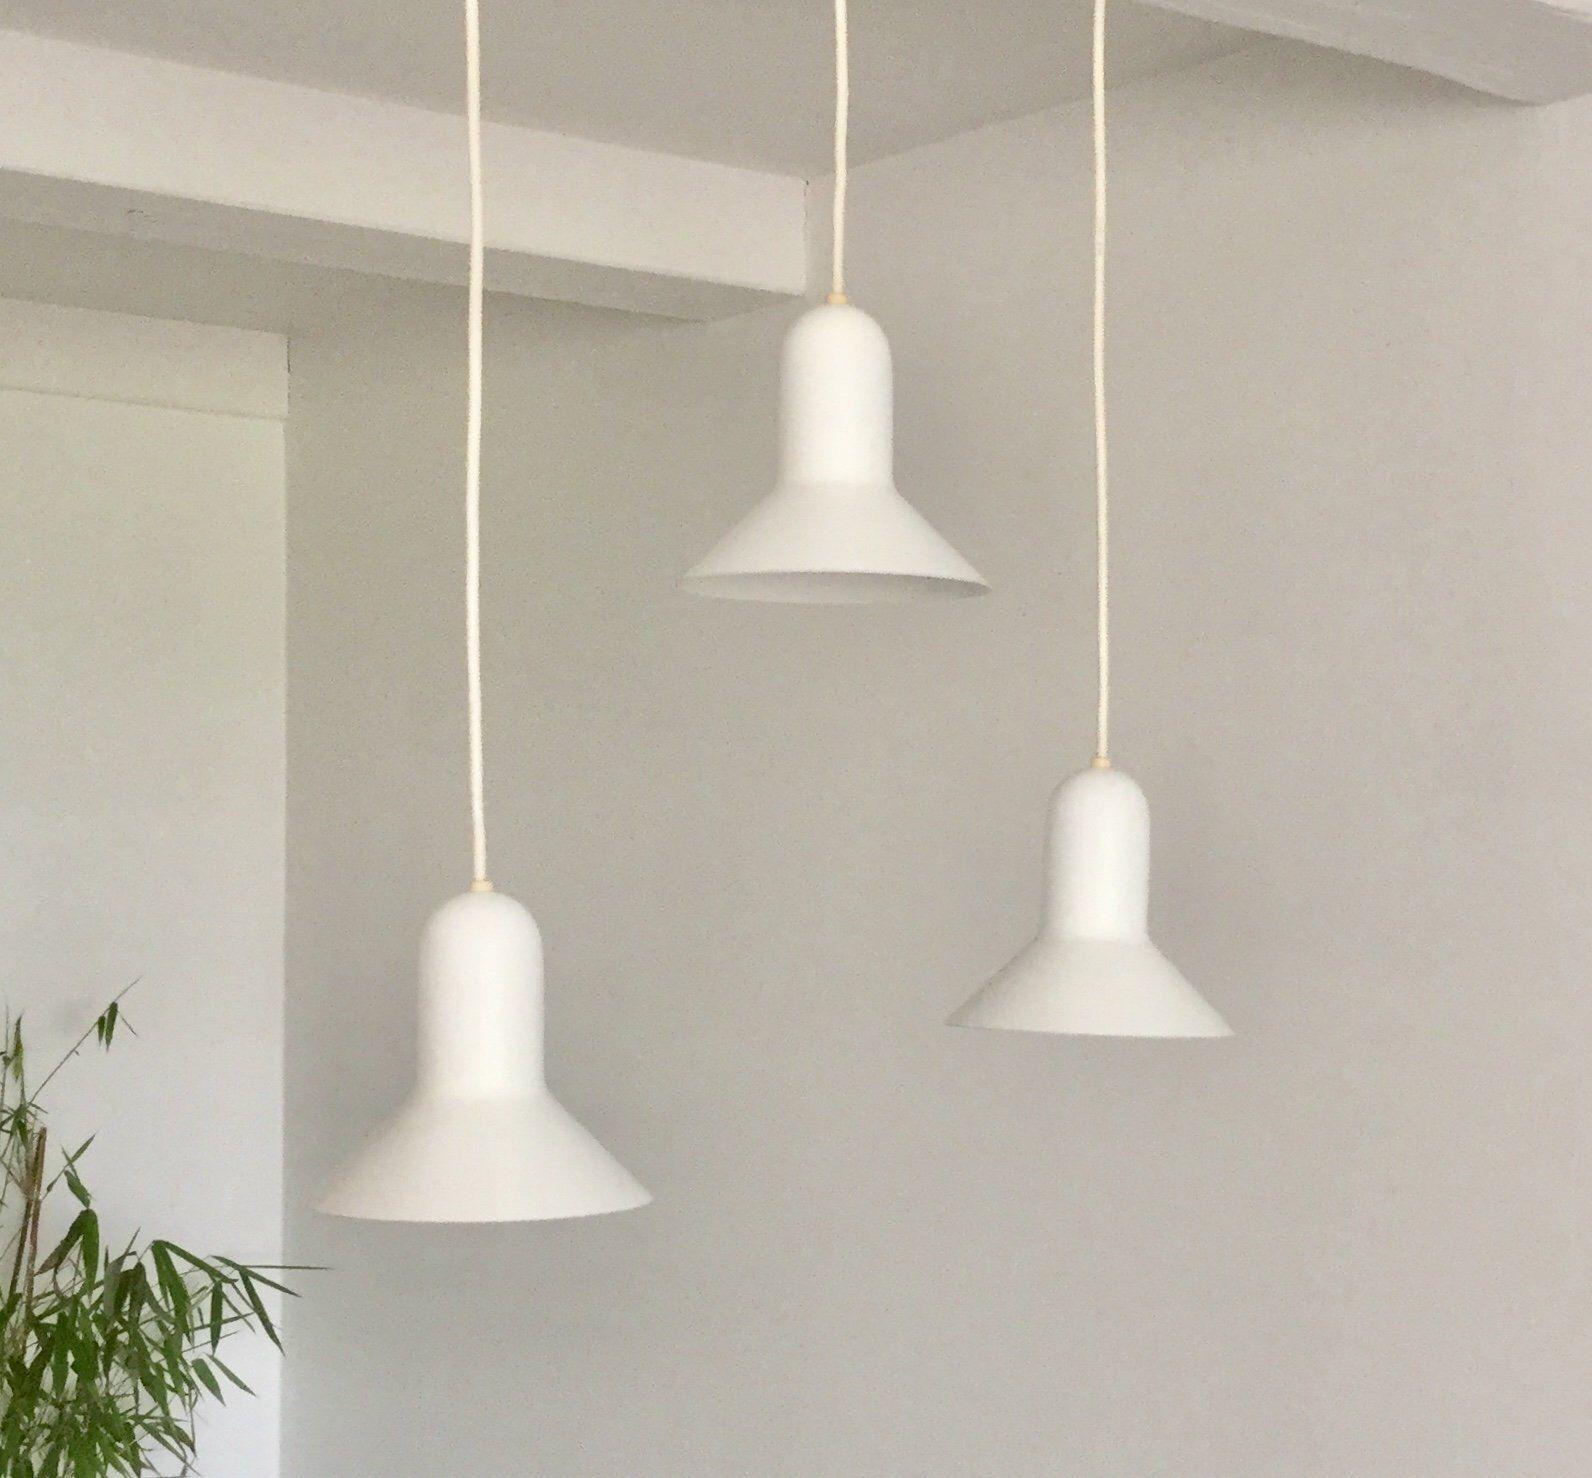 Confetti hanging lamps Claus Bonderup for Focus